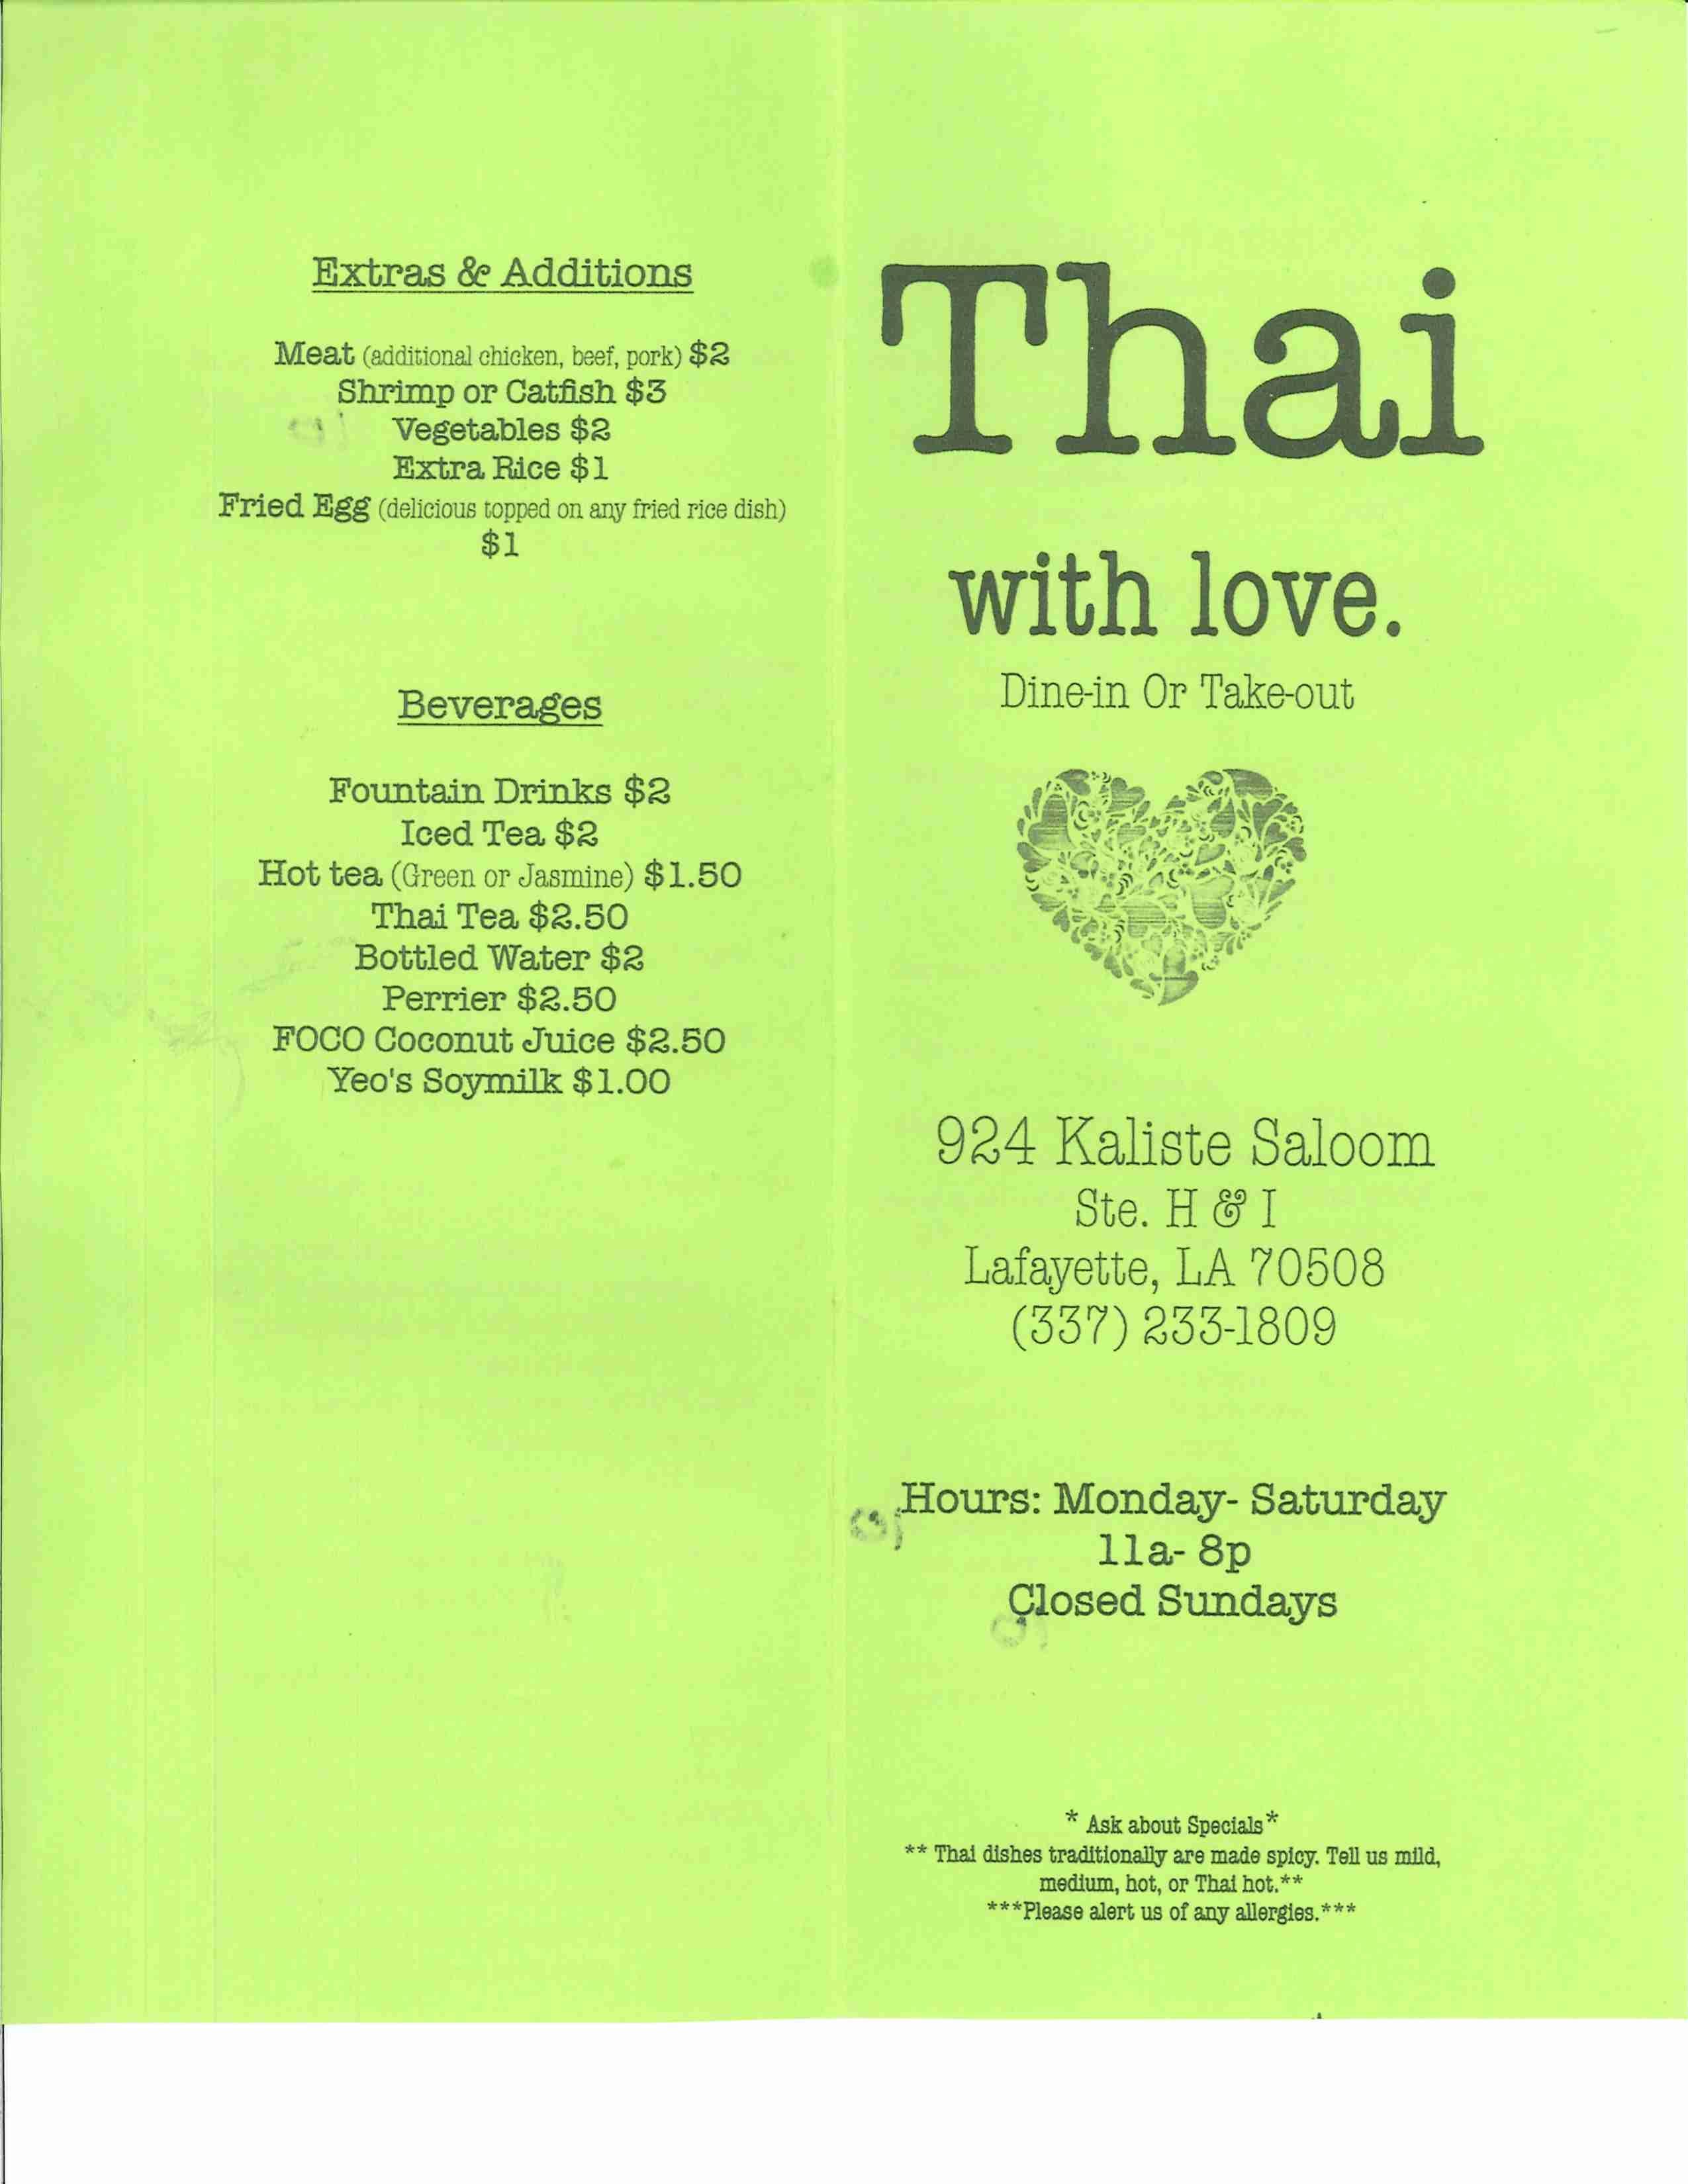 1809 Menu thai with love menu, menu for thai with love, lafayette